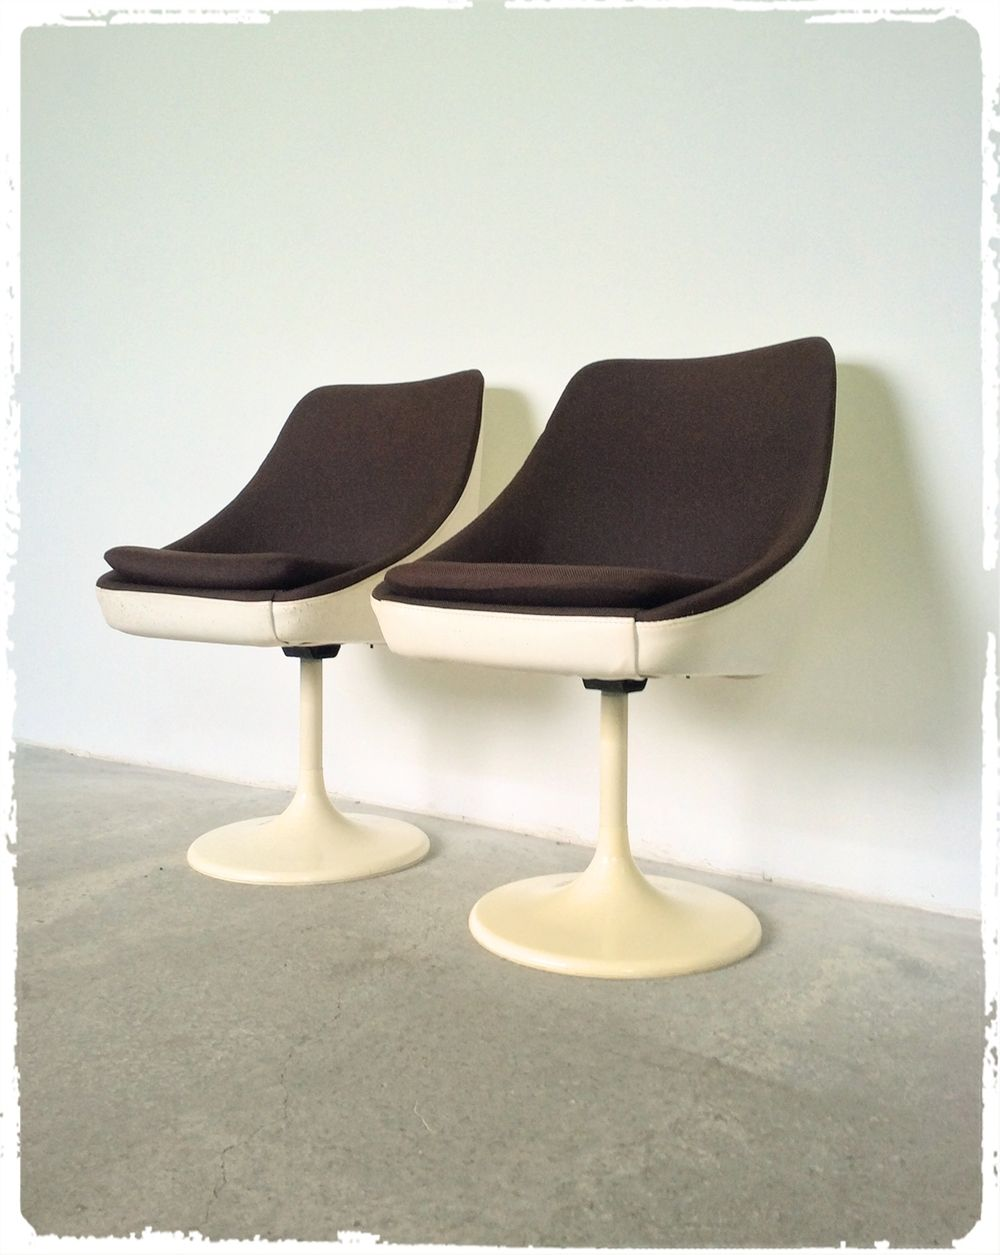 Oompa Paire De Fauteuils Chaises Pied Tulipe Joe Colombo Erzeugnis Lush 1972 Lounge Chair Egg Chair Chair